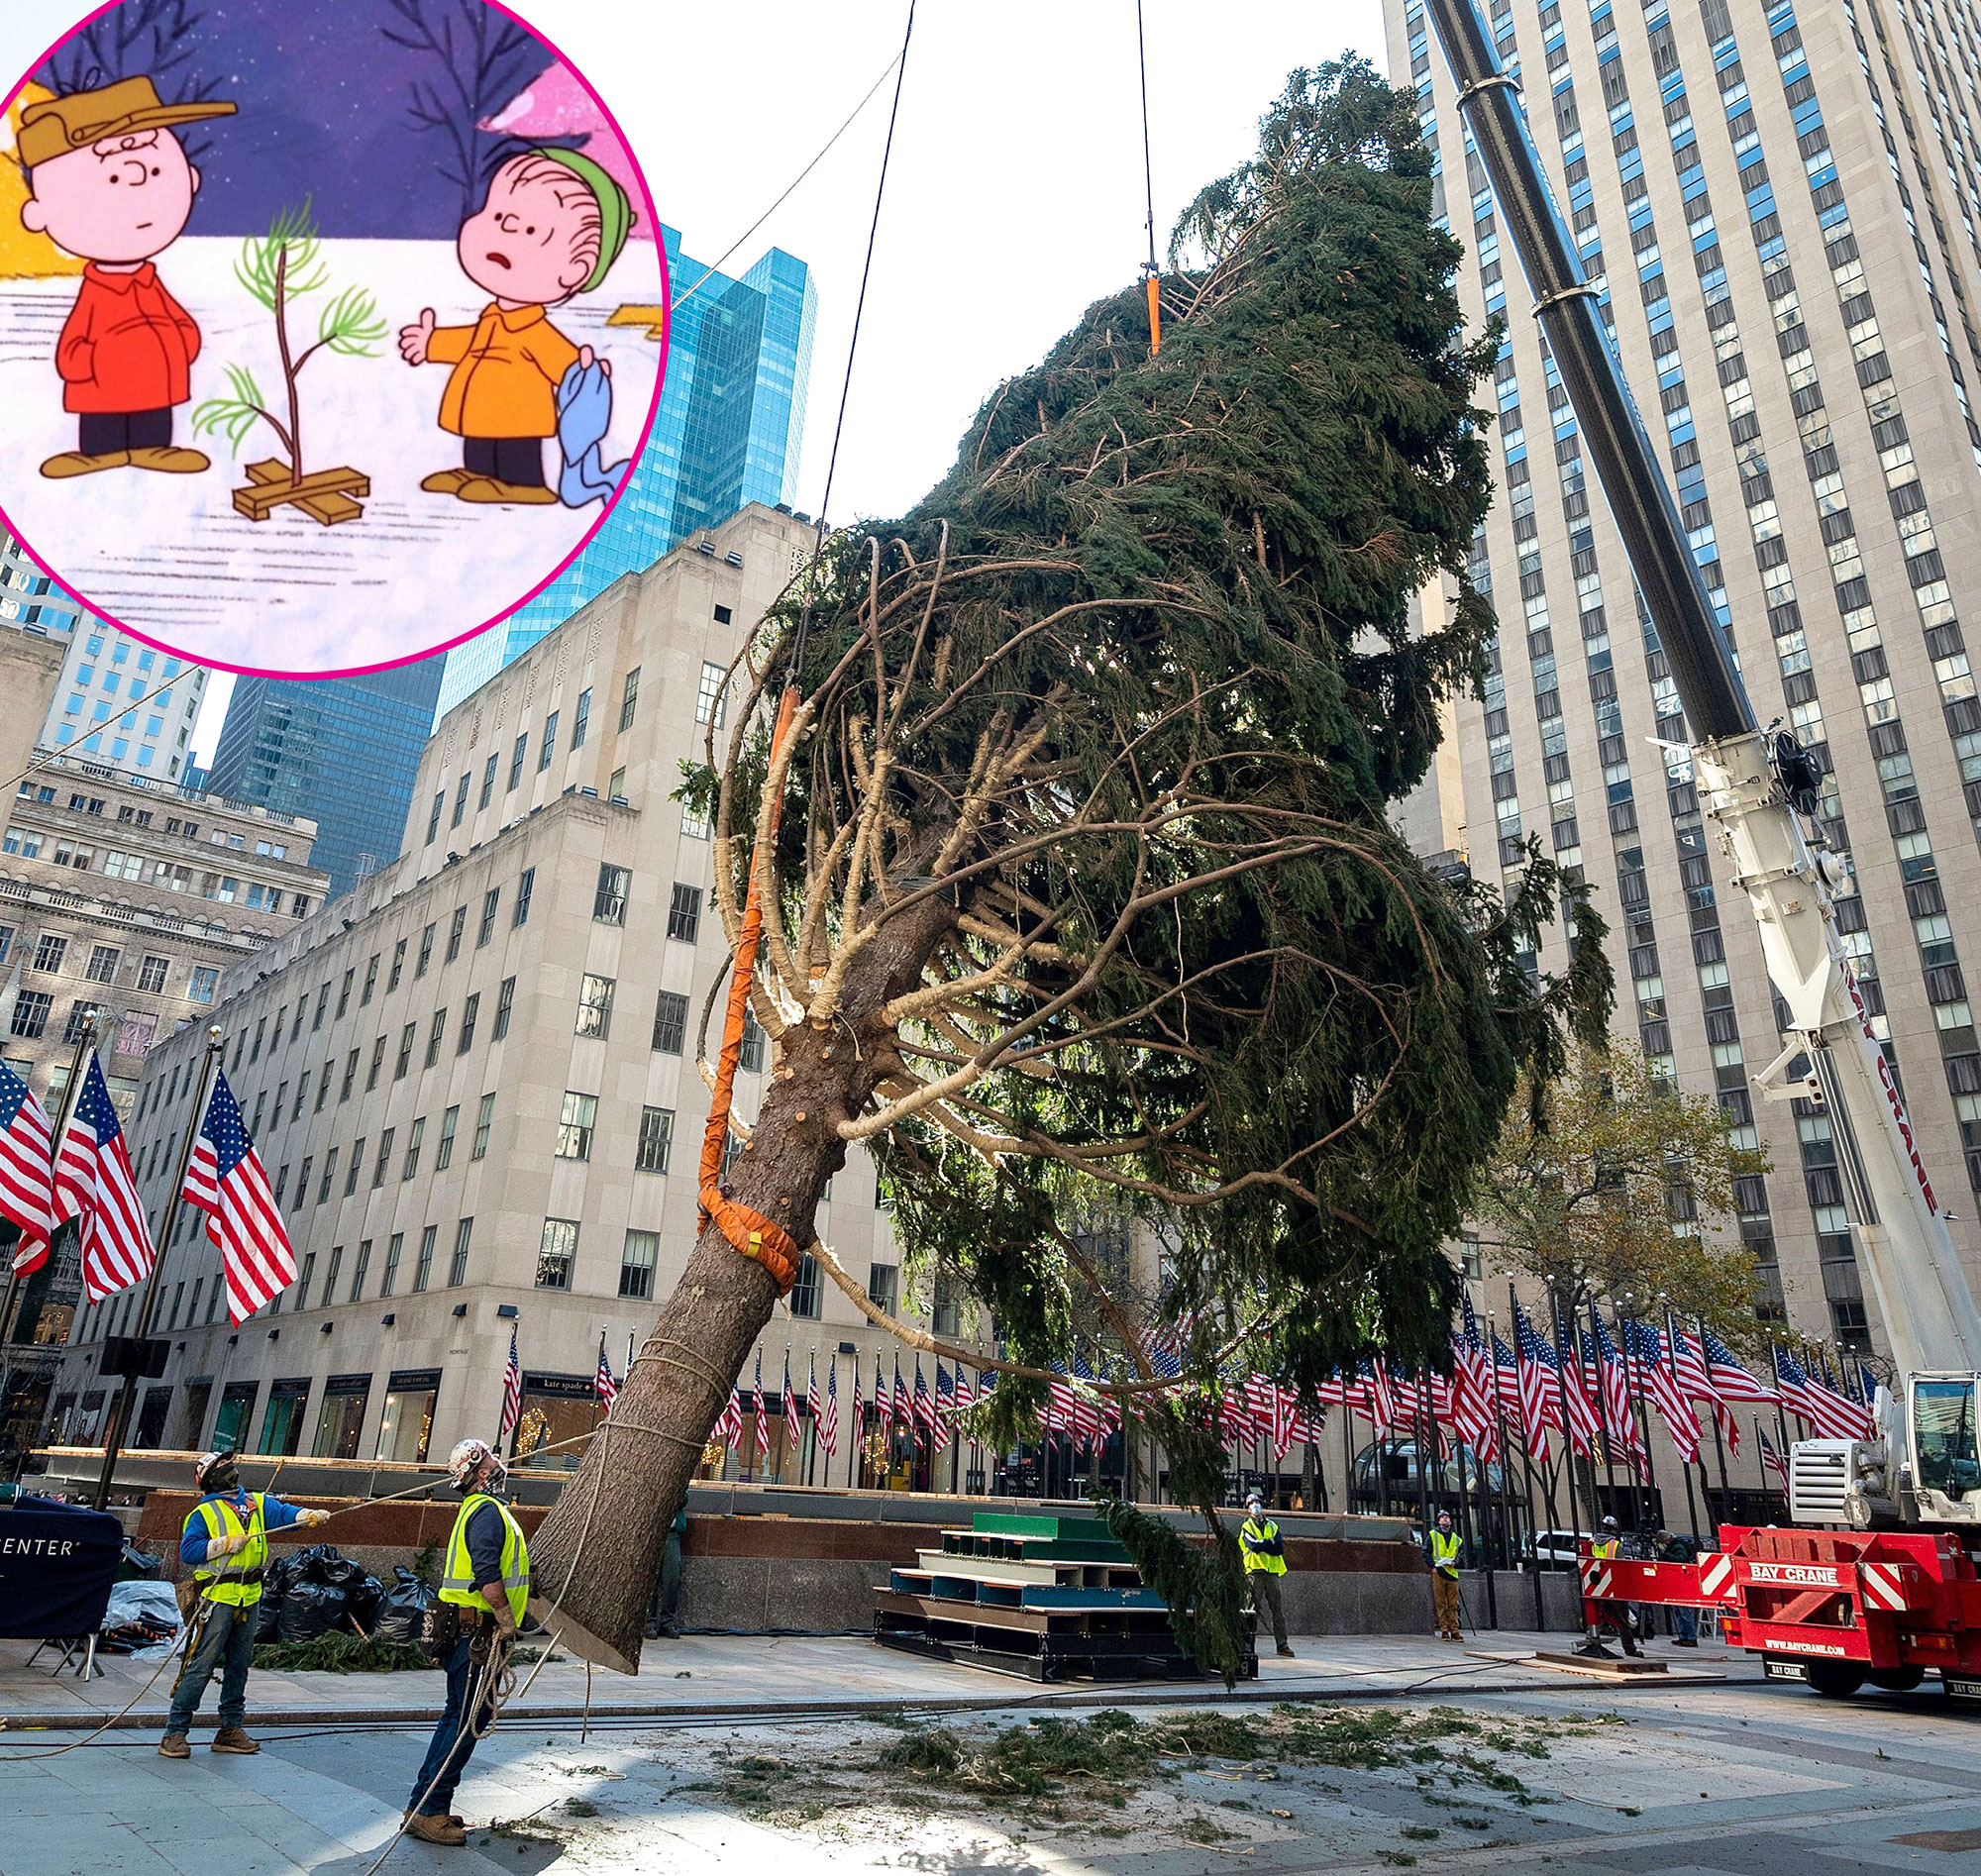 cwn vfmccsatfm https www usmagazine com celebrity news news rockefeller center claps back over viral 2020 christmas tree